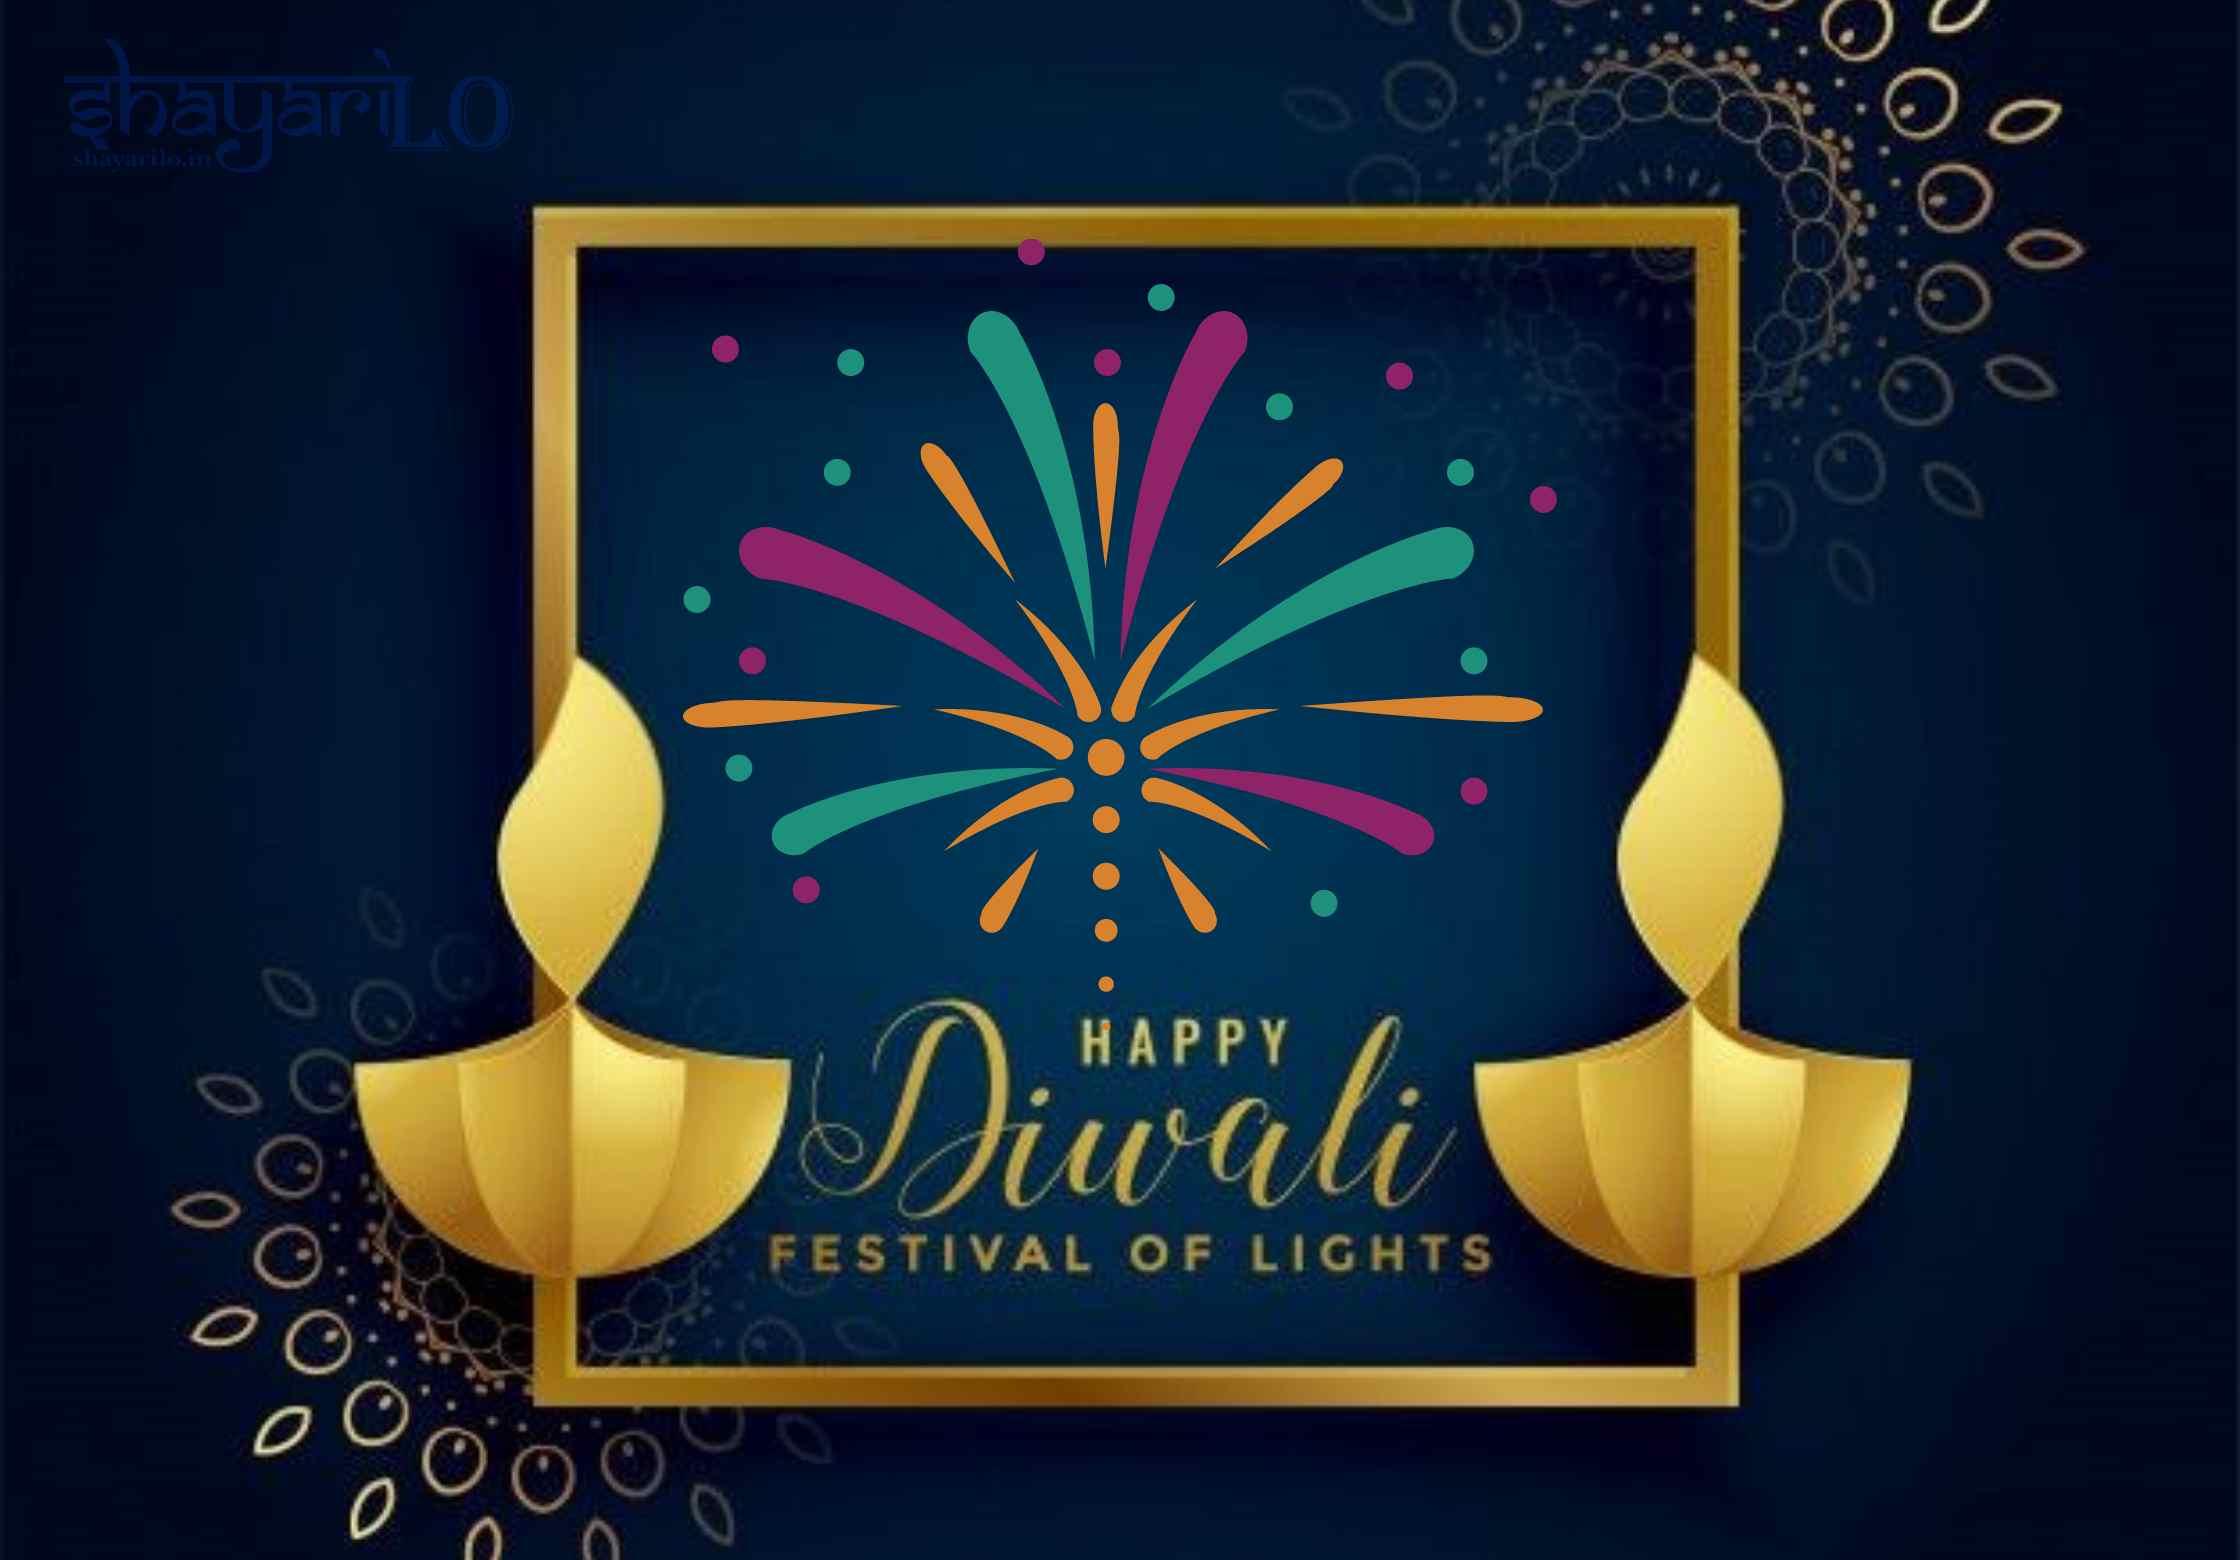 Festival of lights happy diwali